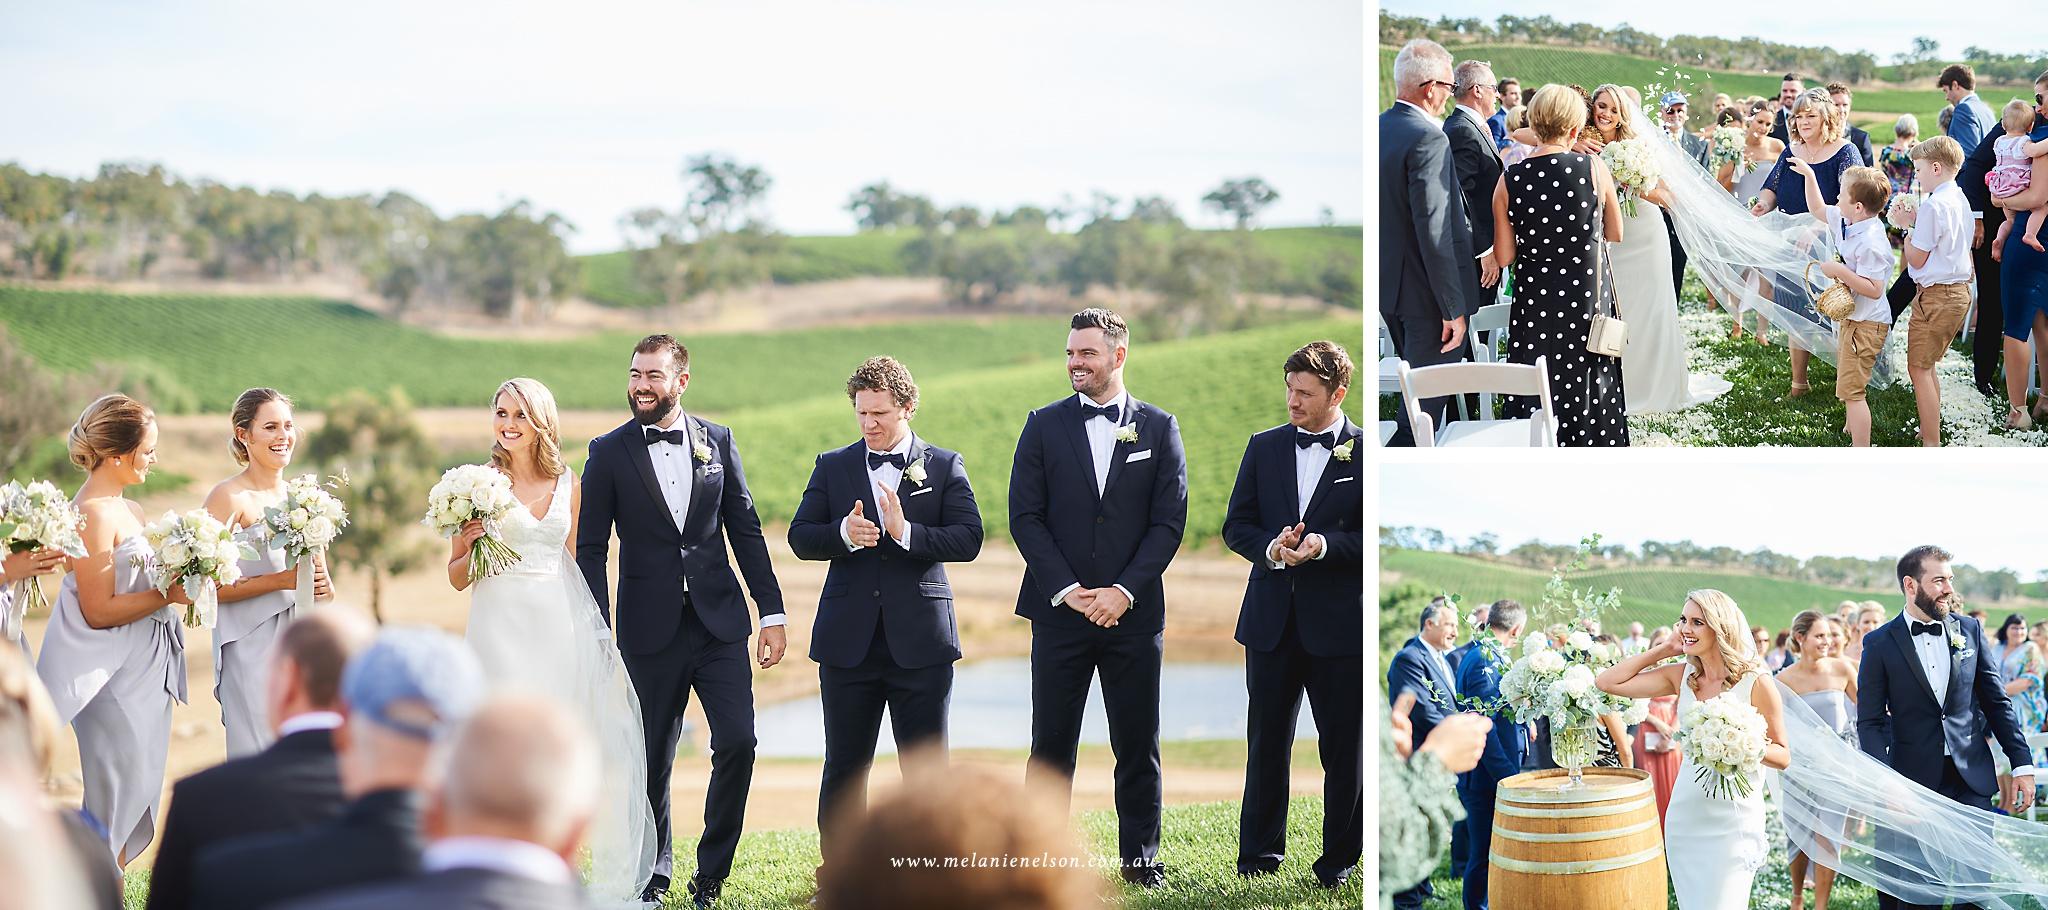 longview_vineyard_wedding_0048.jpg